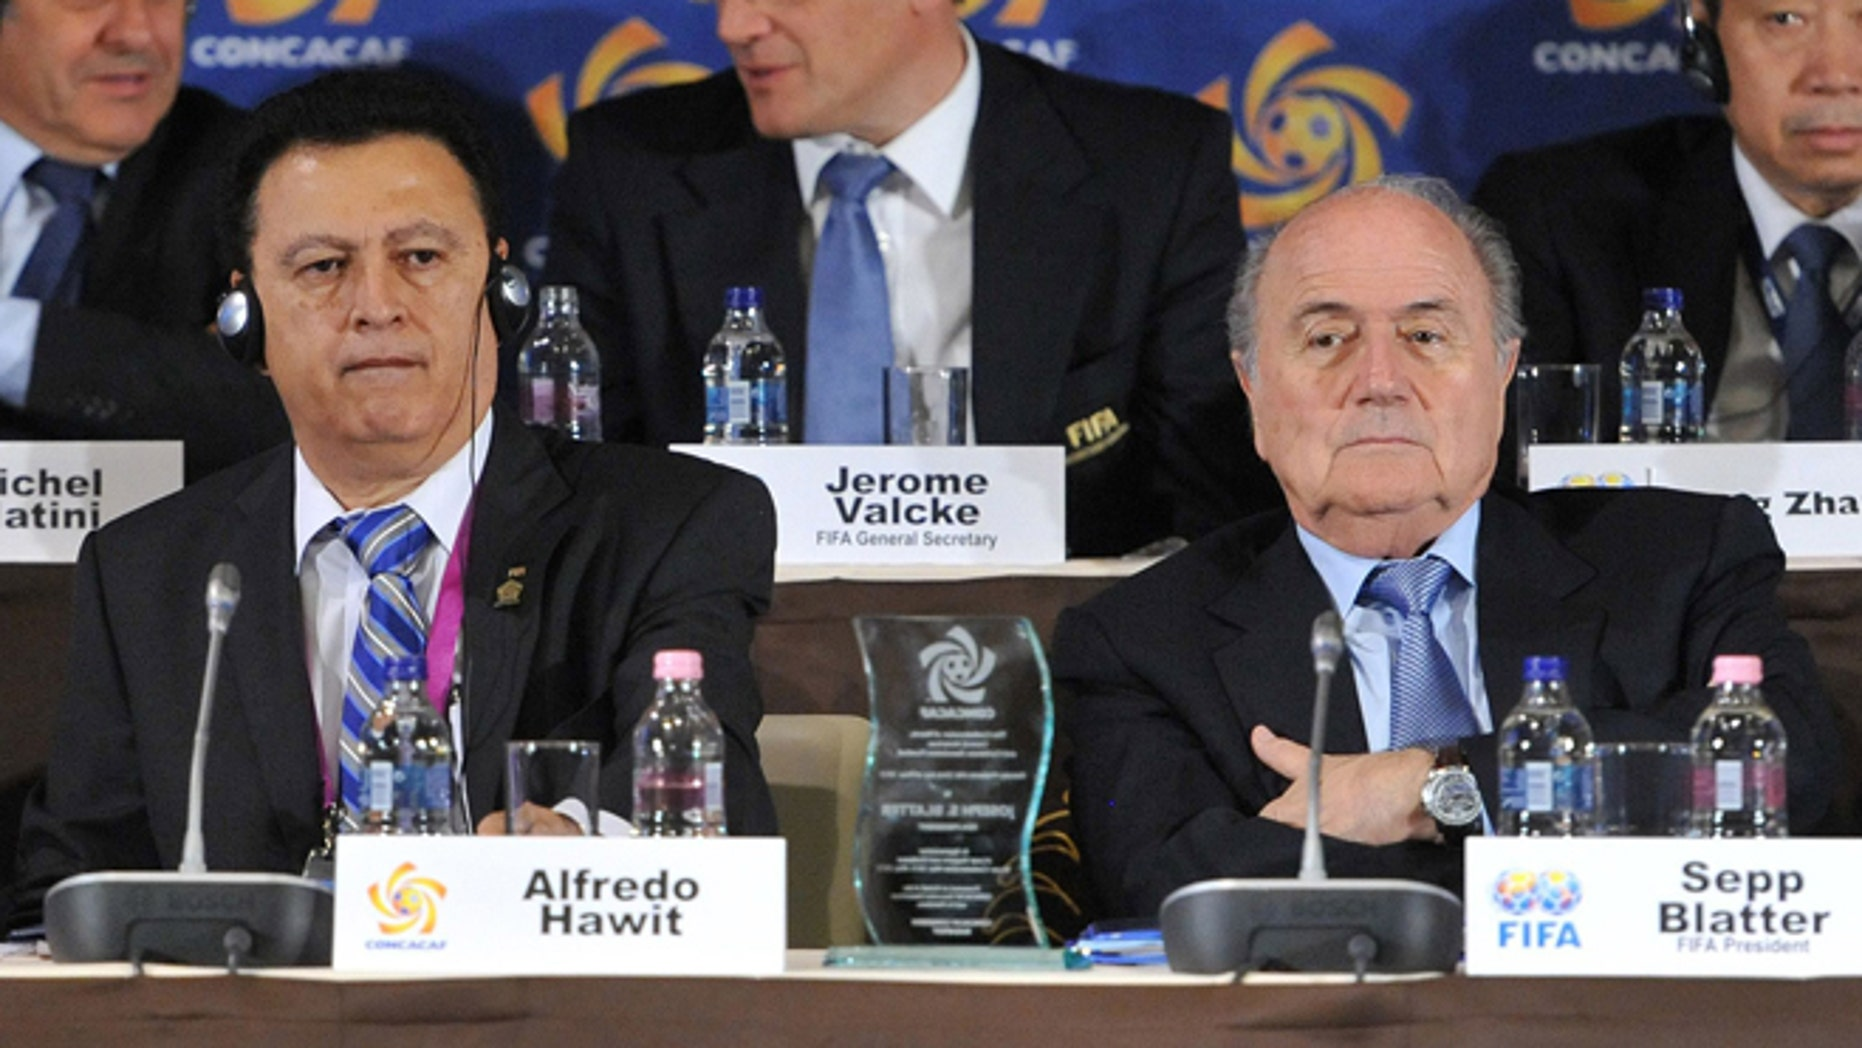 16 more arrested in FIFA corruption probe, including five ...